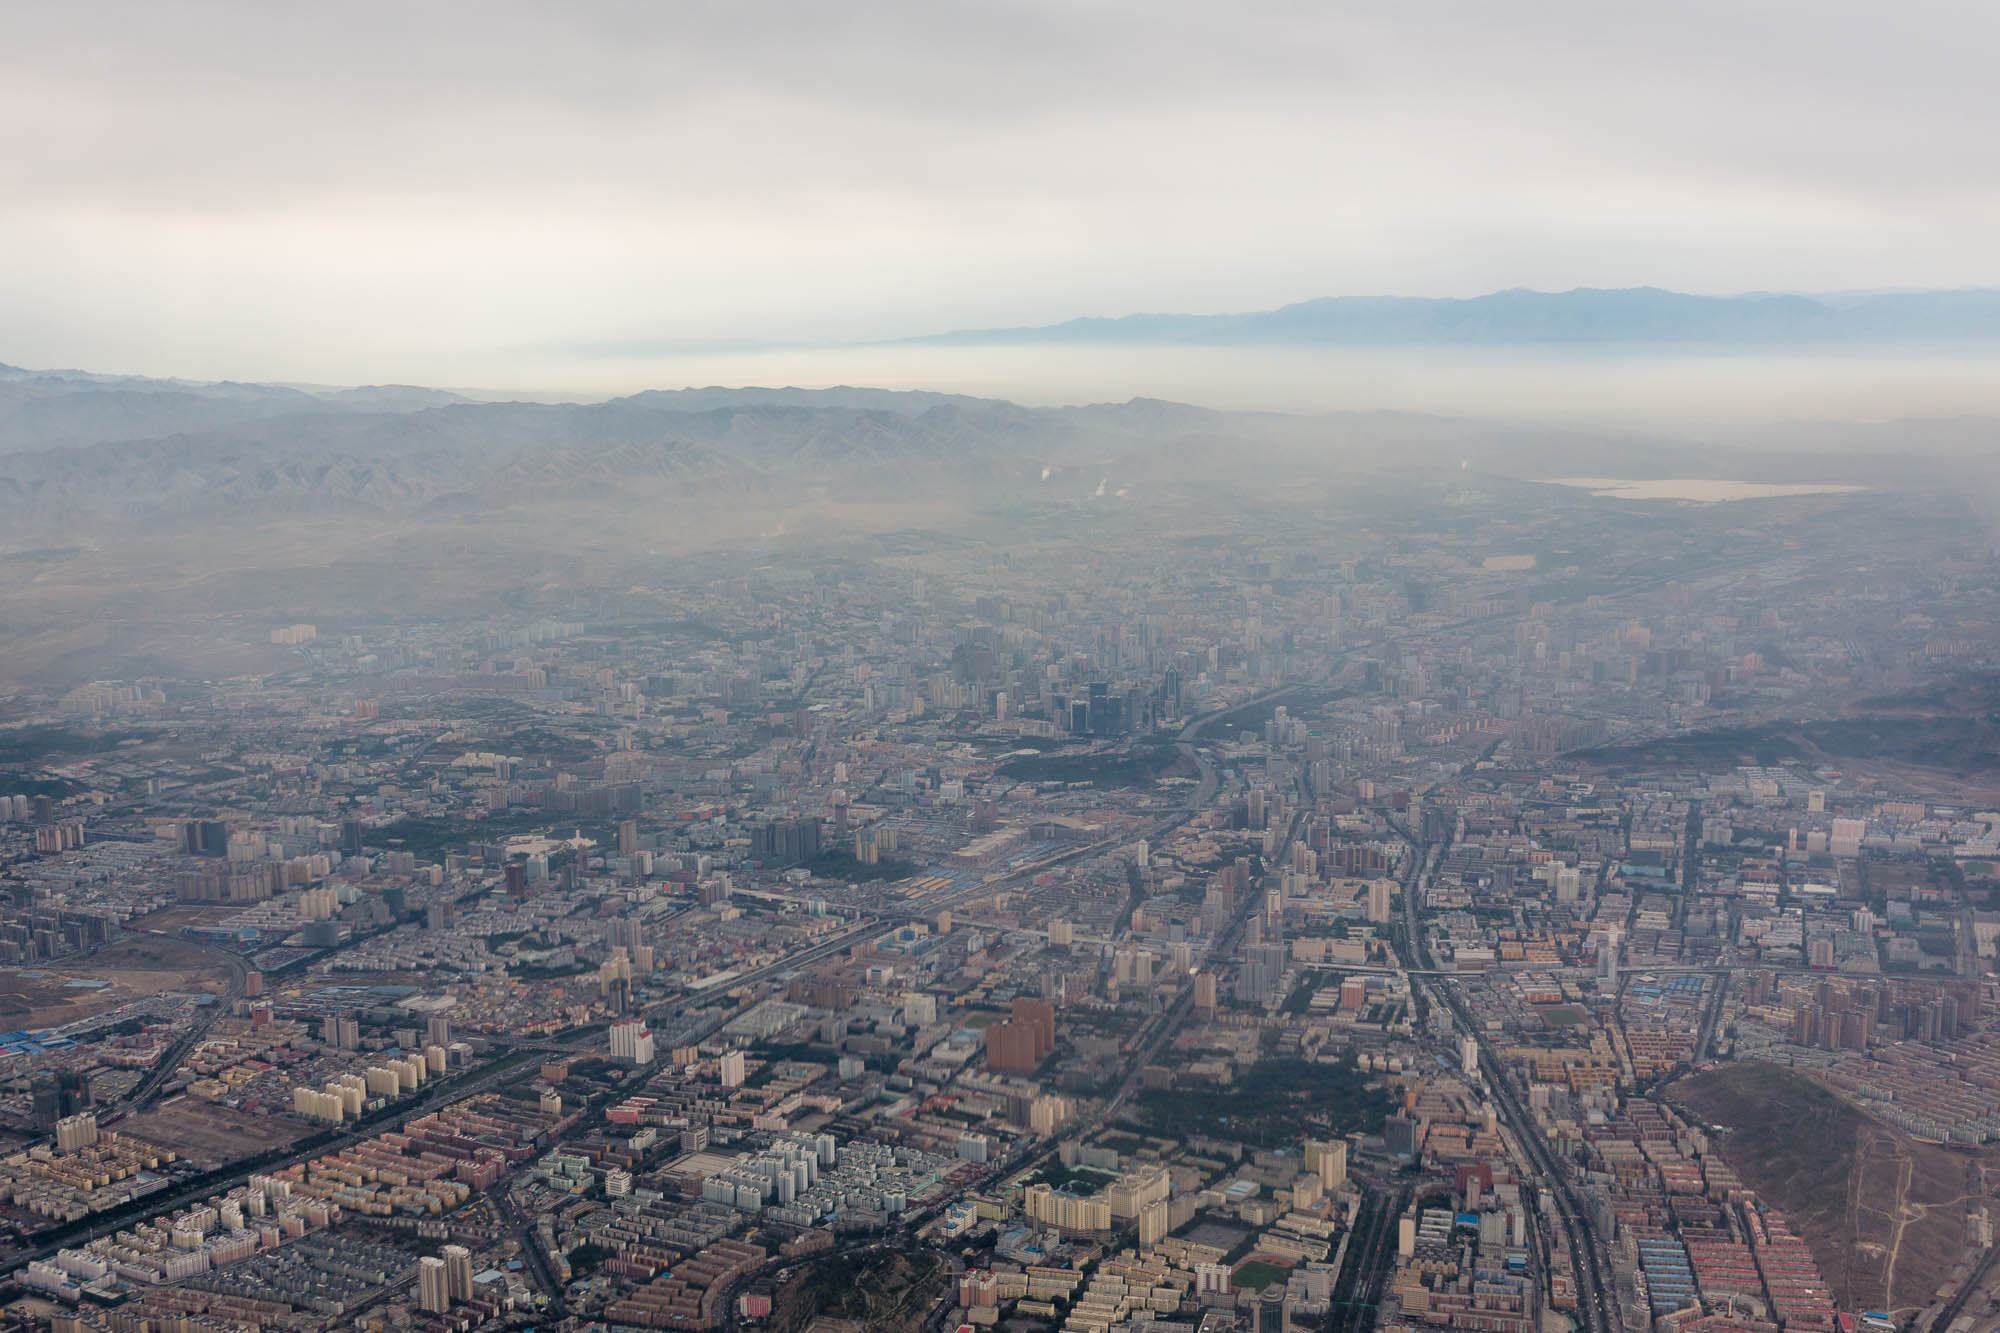 Ürümqi from above